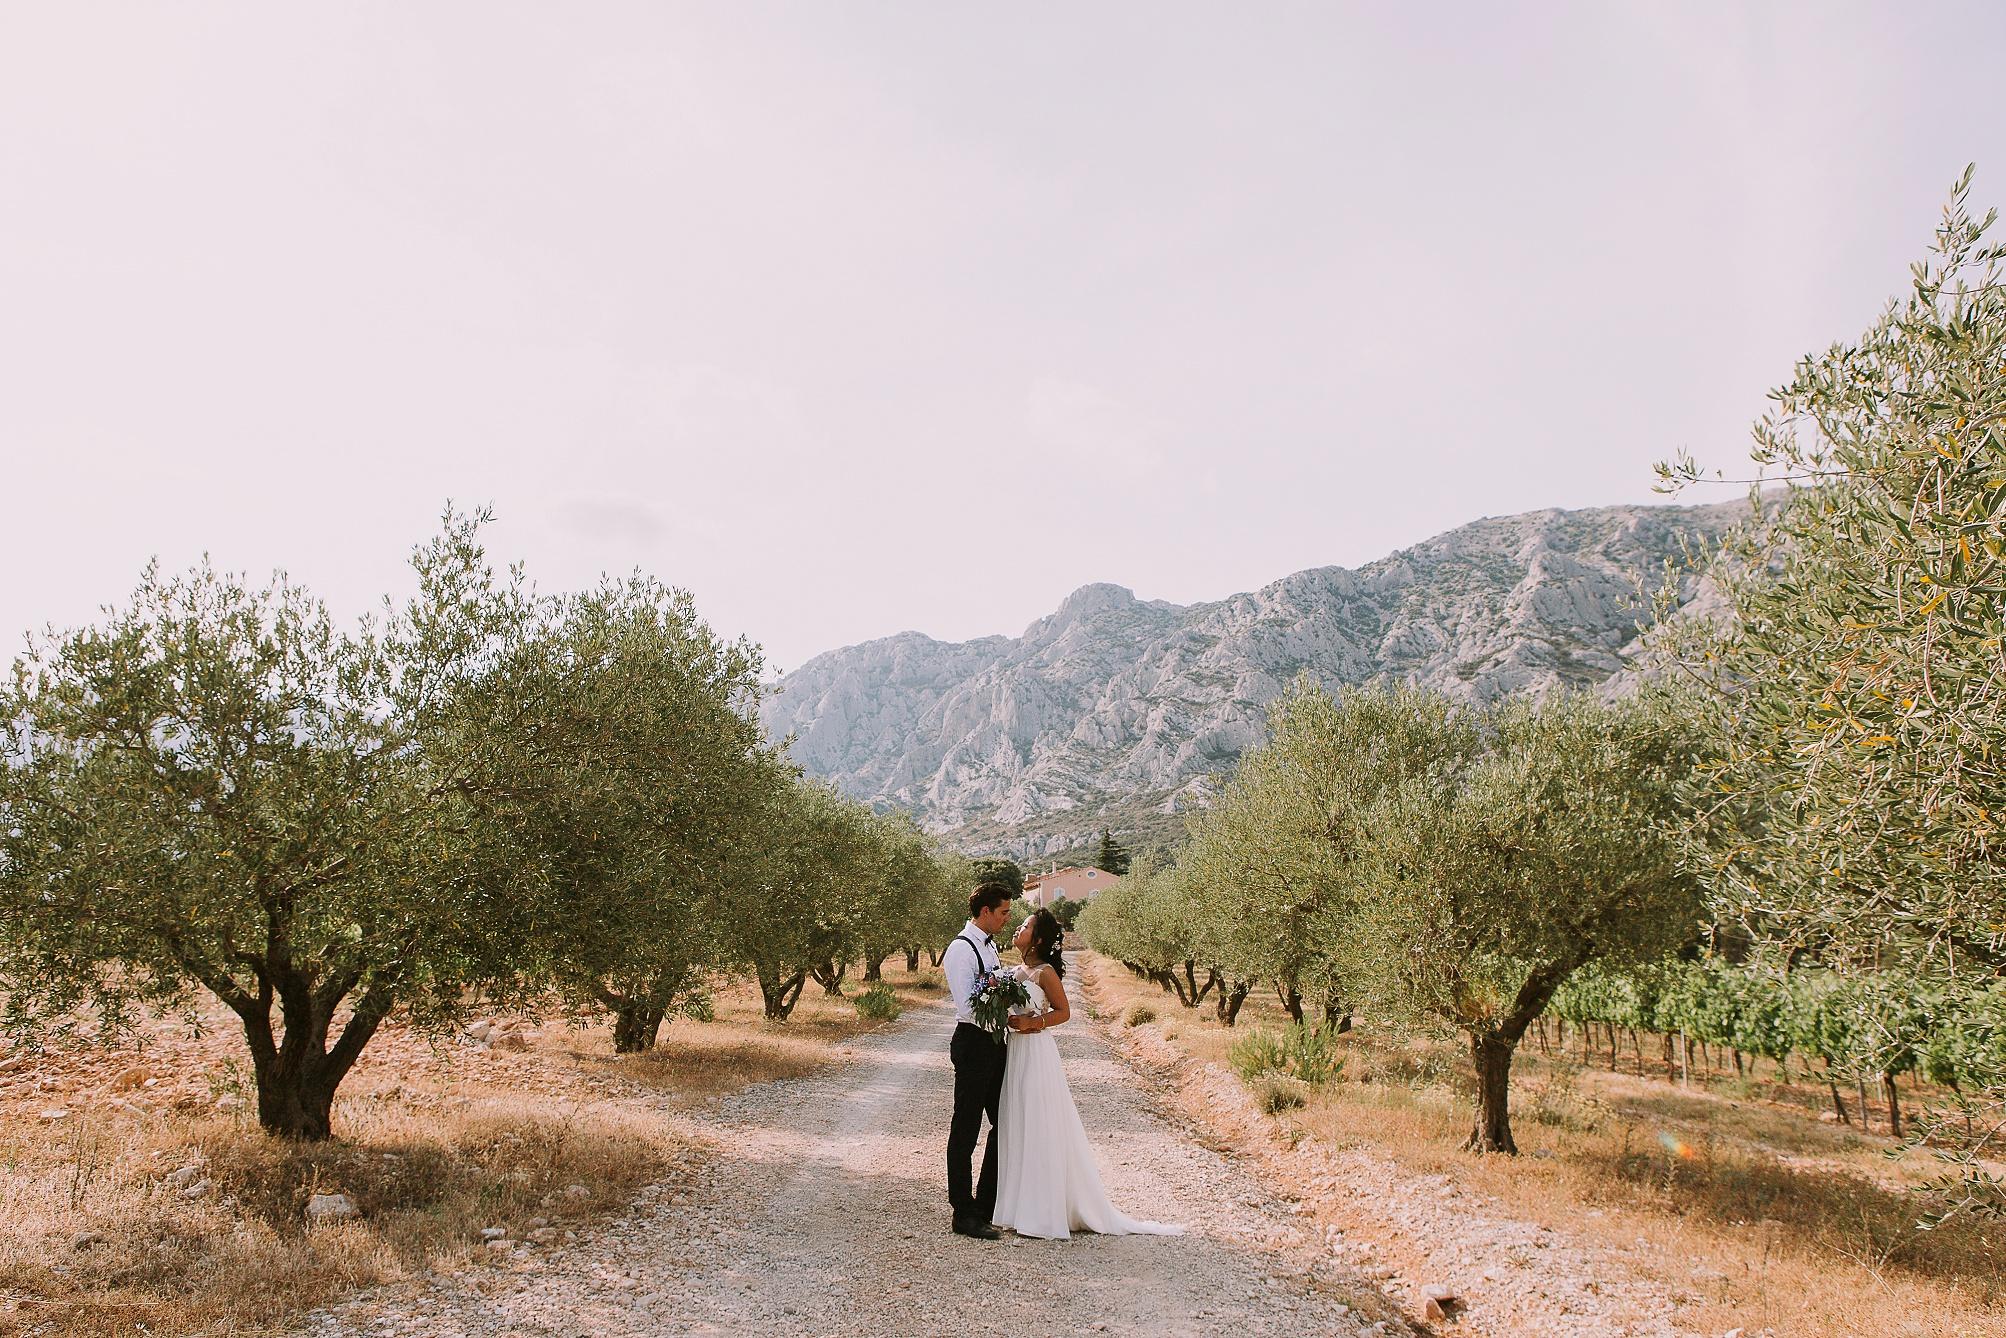 katerynaphotos-mariage-photographe-puyloubier-provence-aix-en-provence-sud-de-la-france_0396.jpg